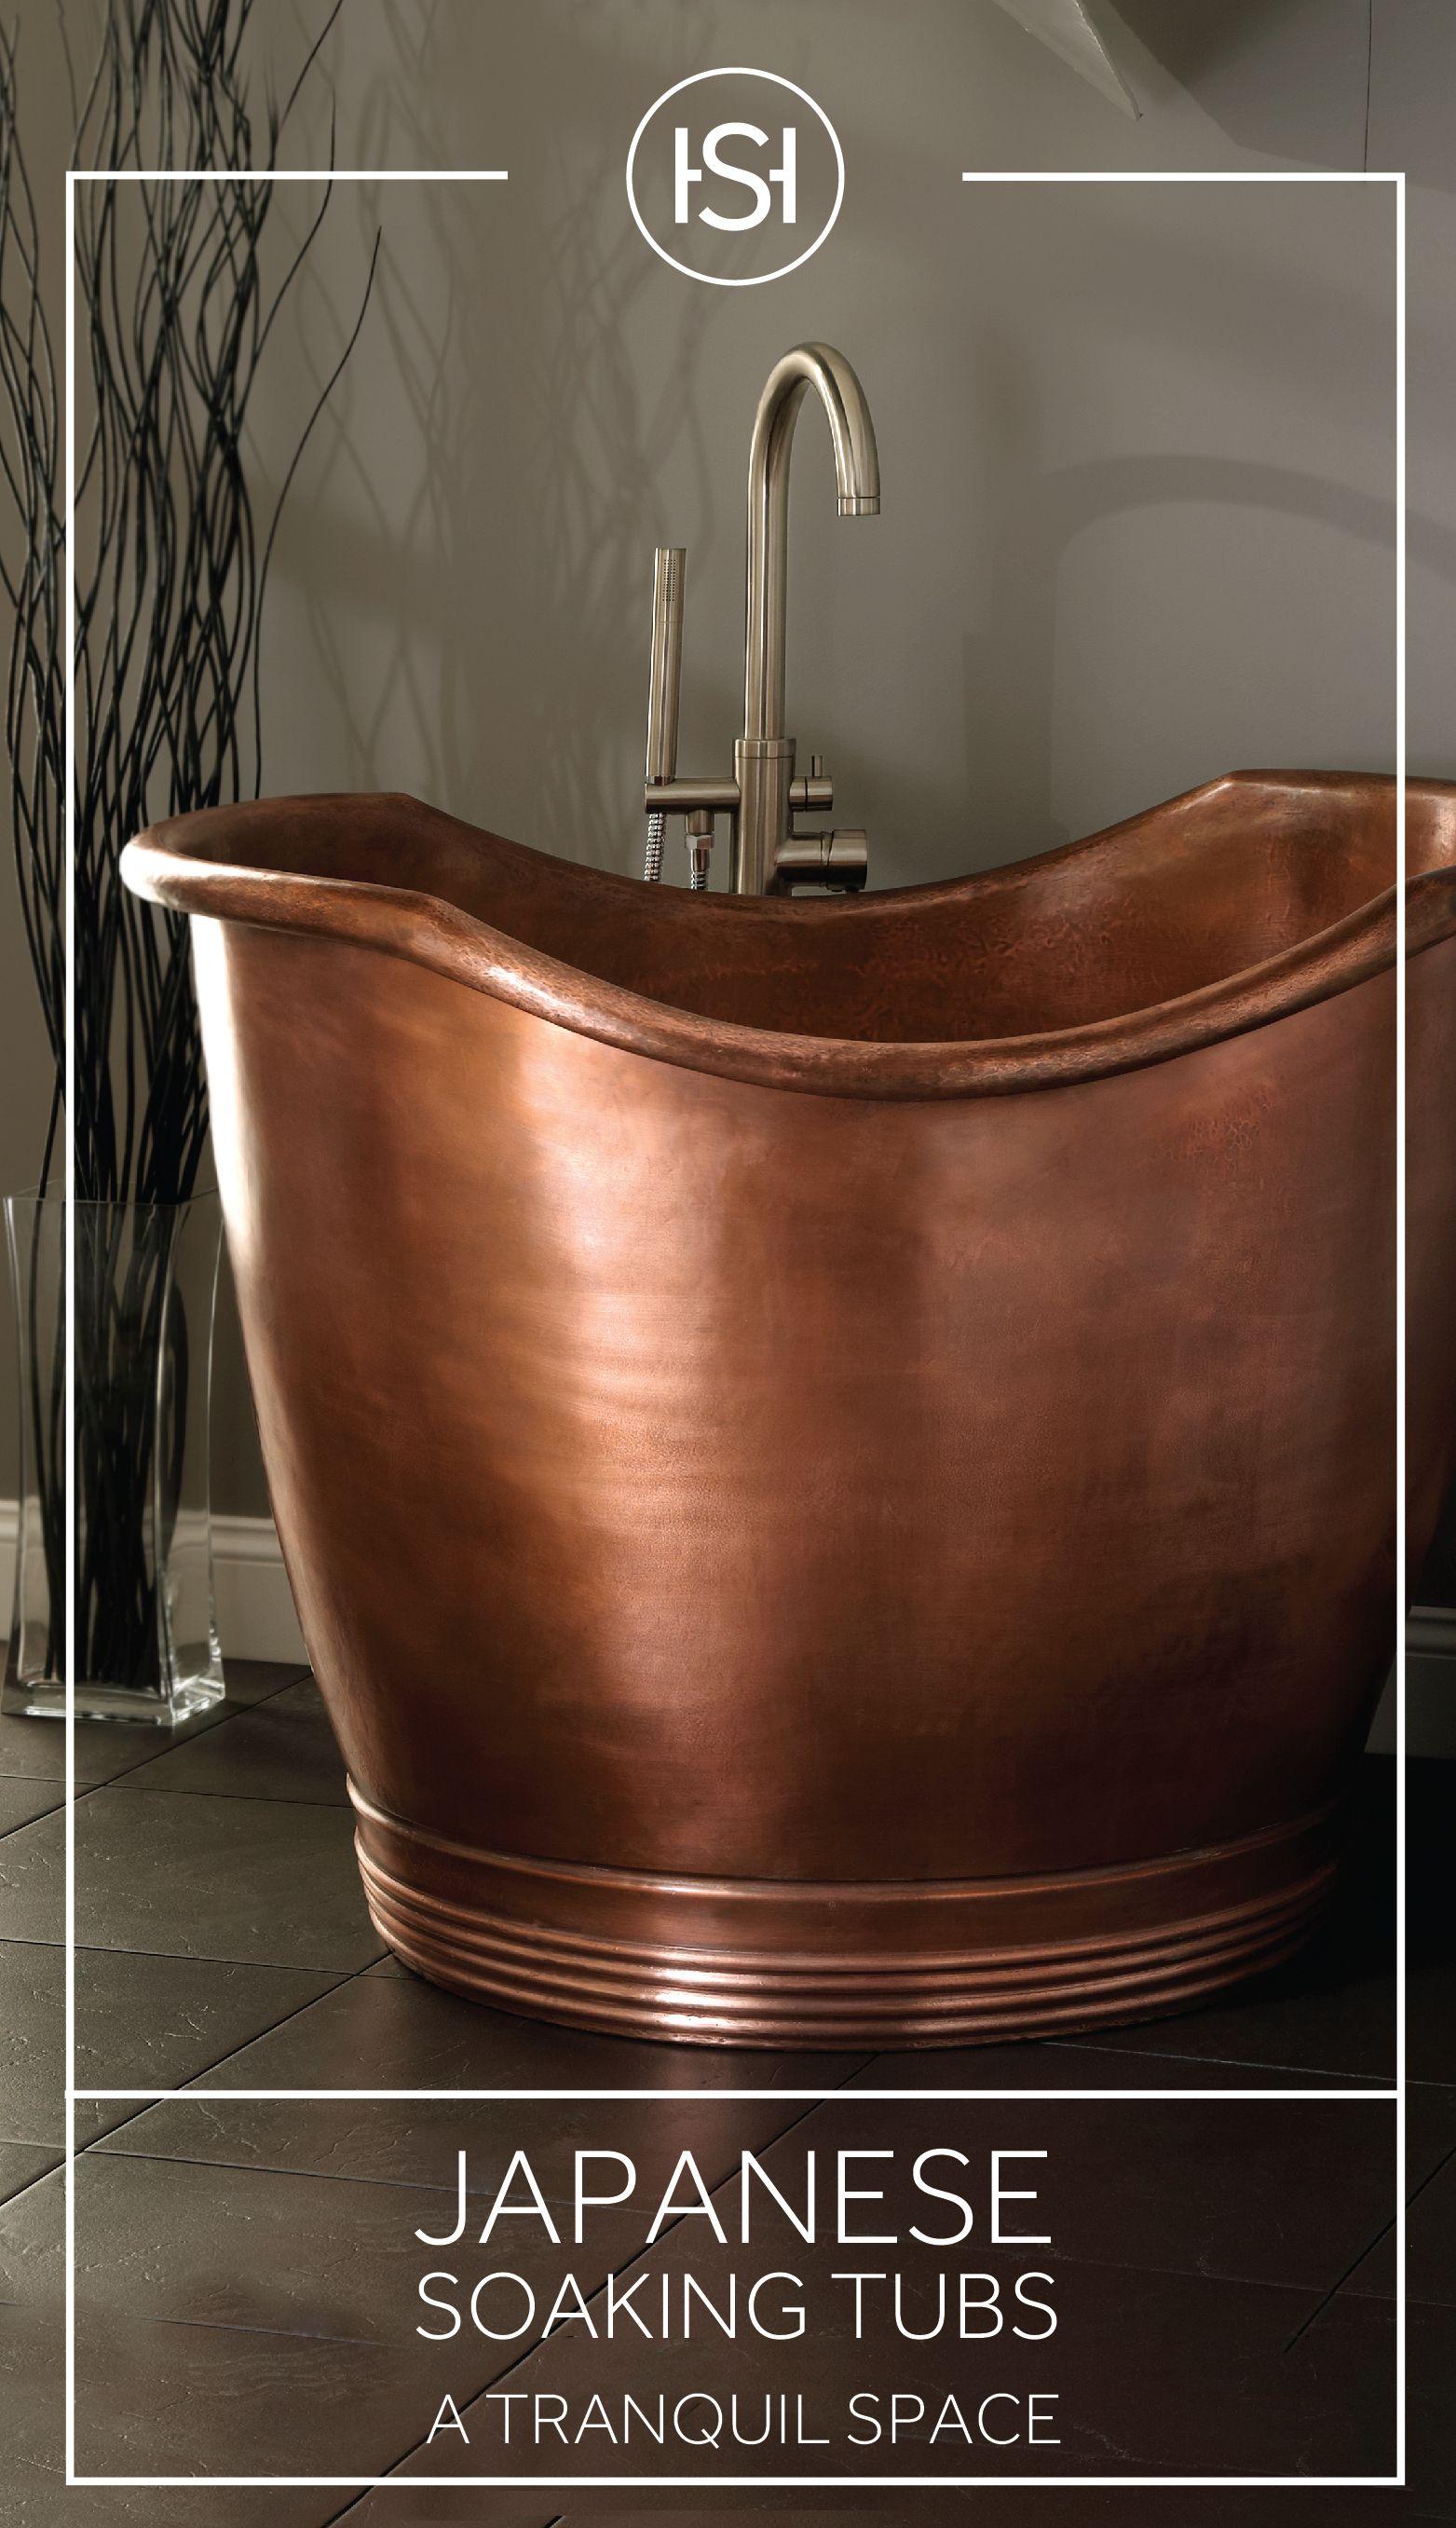 A Japanese Soaking Tub Strikes The Perfect Balance Between Comfort